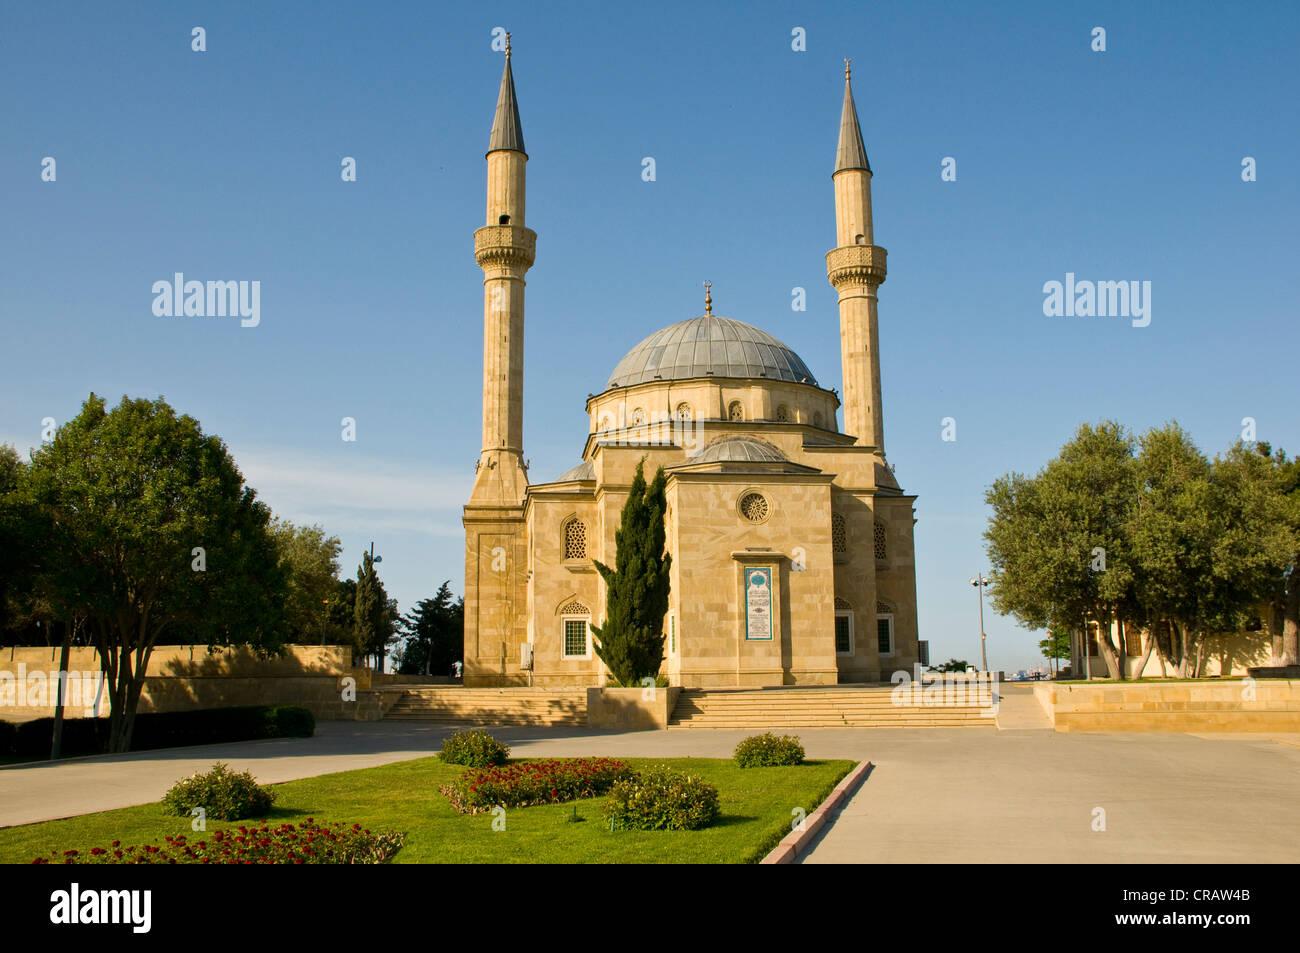 Mosque with minarets, Baku, Azerbaijan, Middle East Stock Photo